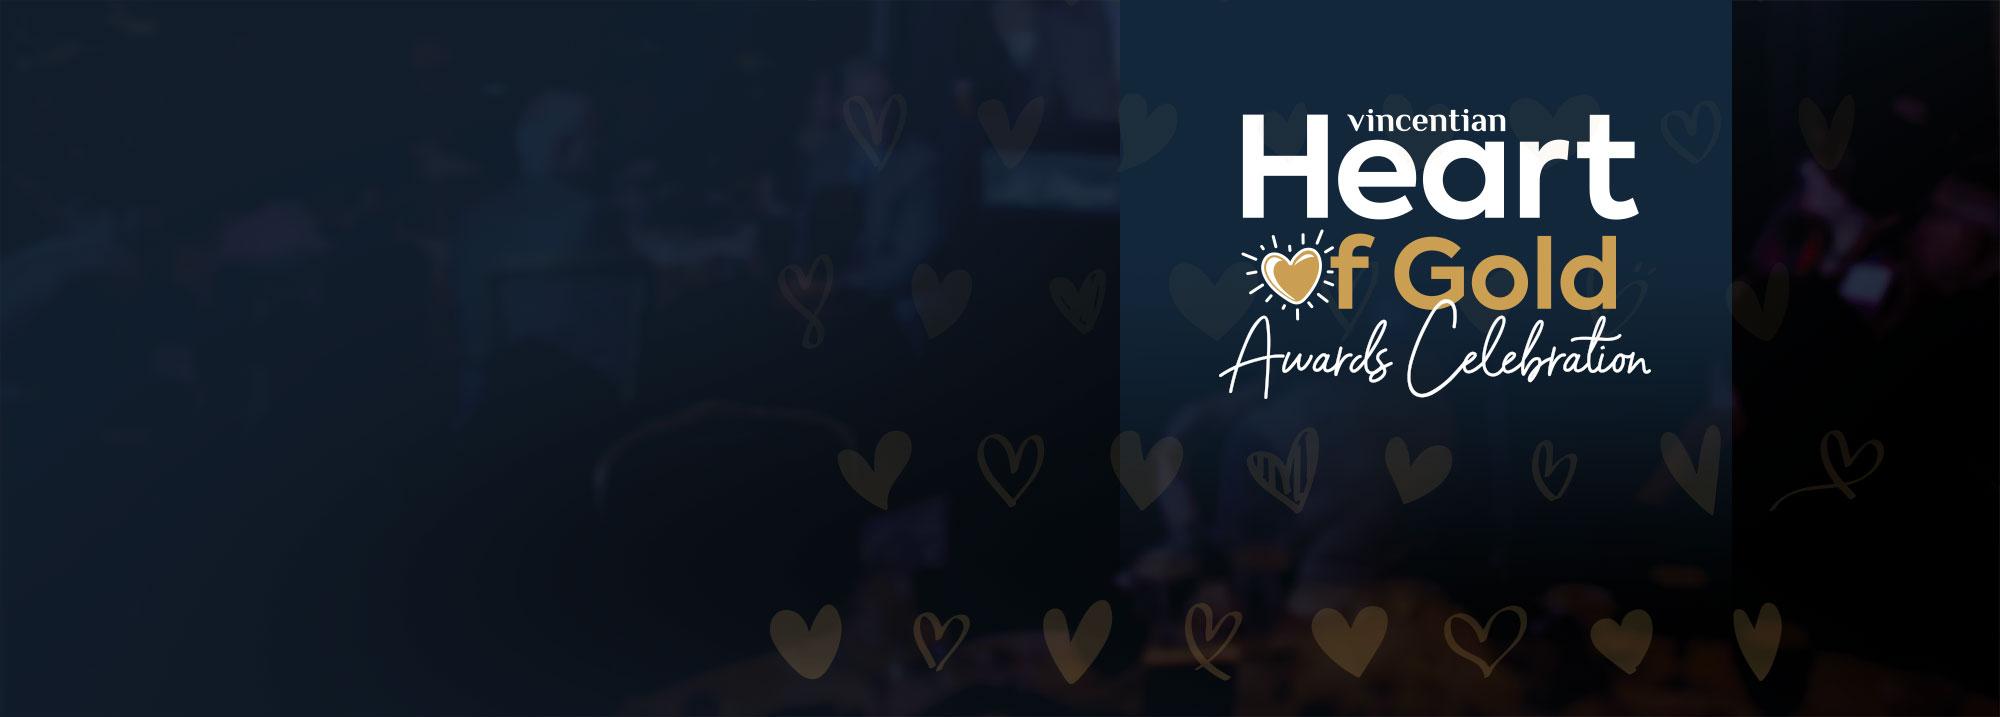 Heart of Gold Awards Celebration